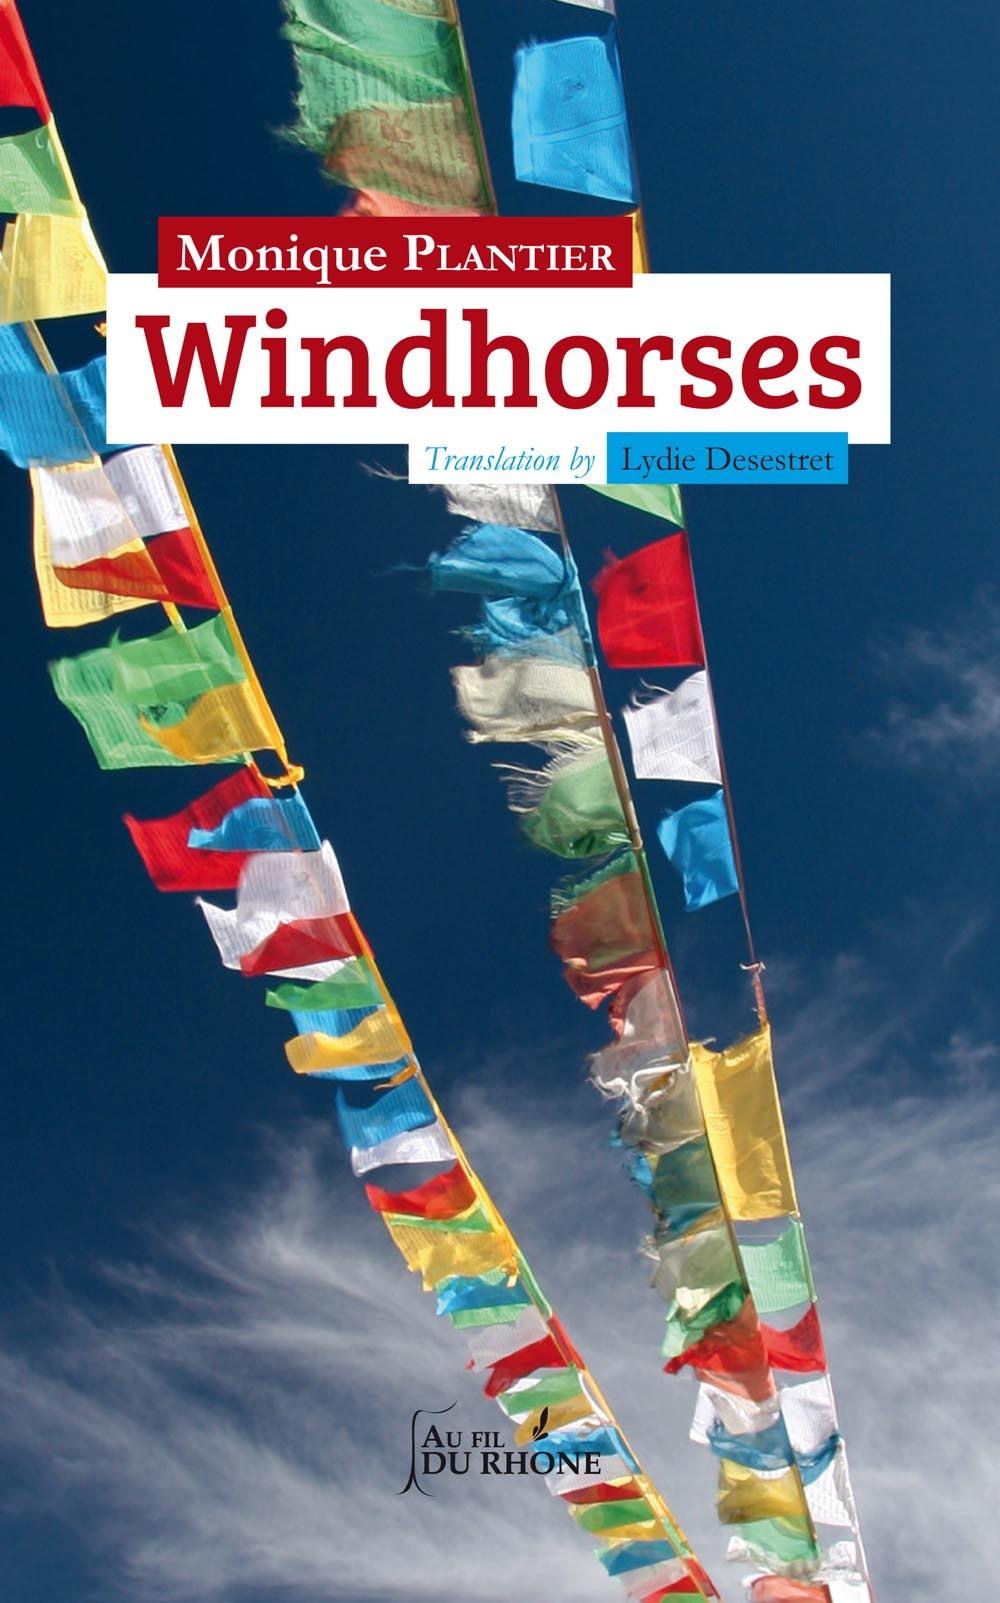 WINDOHORSES